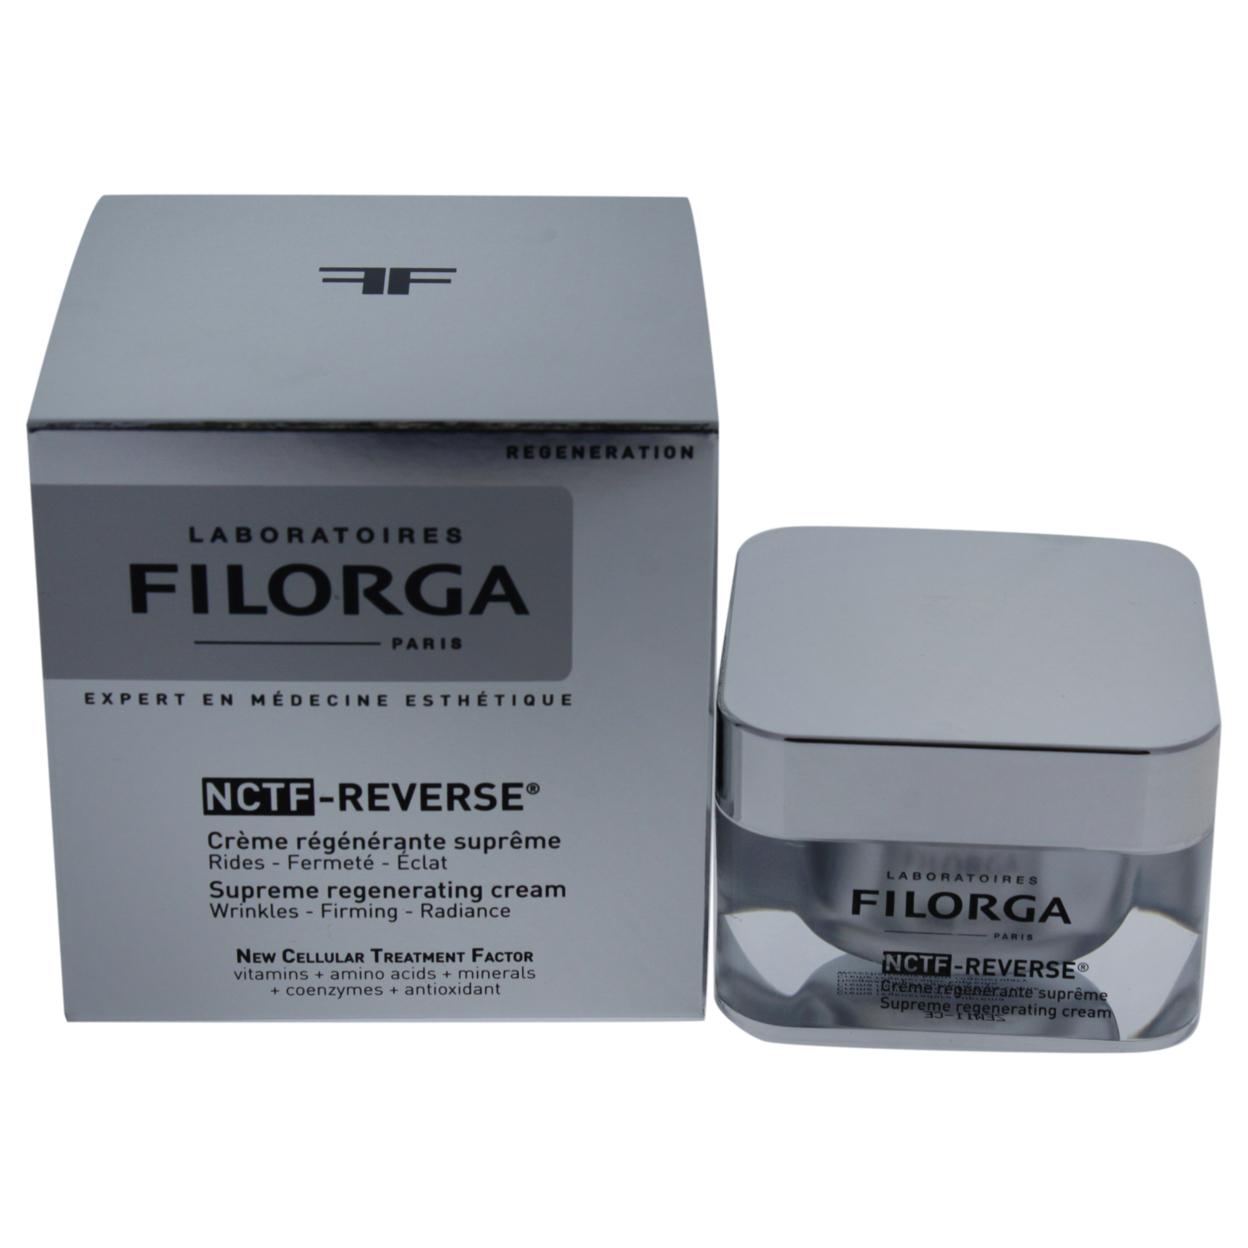 Acure Organics Facial Skin Care - Sensitive Facial Cleanser - 4 Fl. Oz